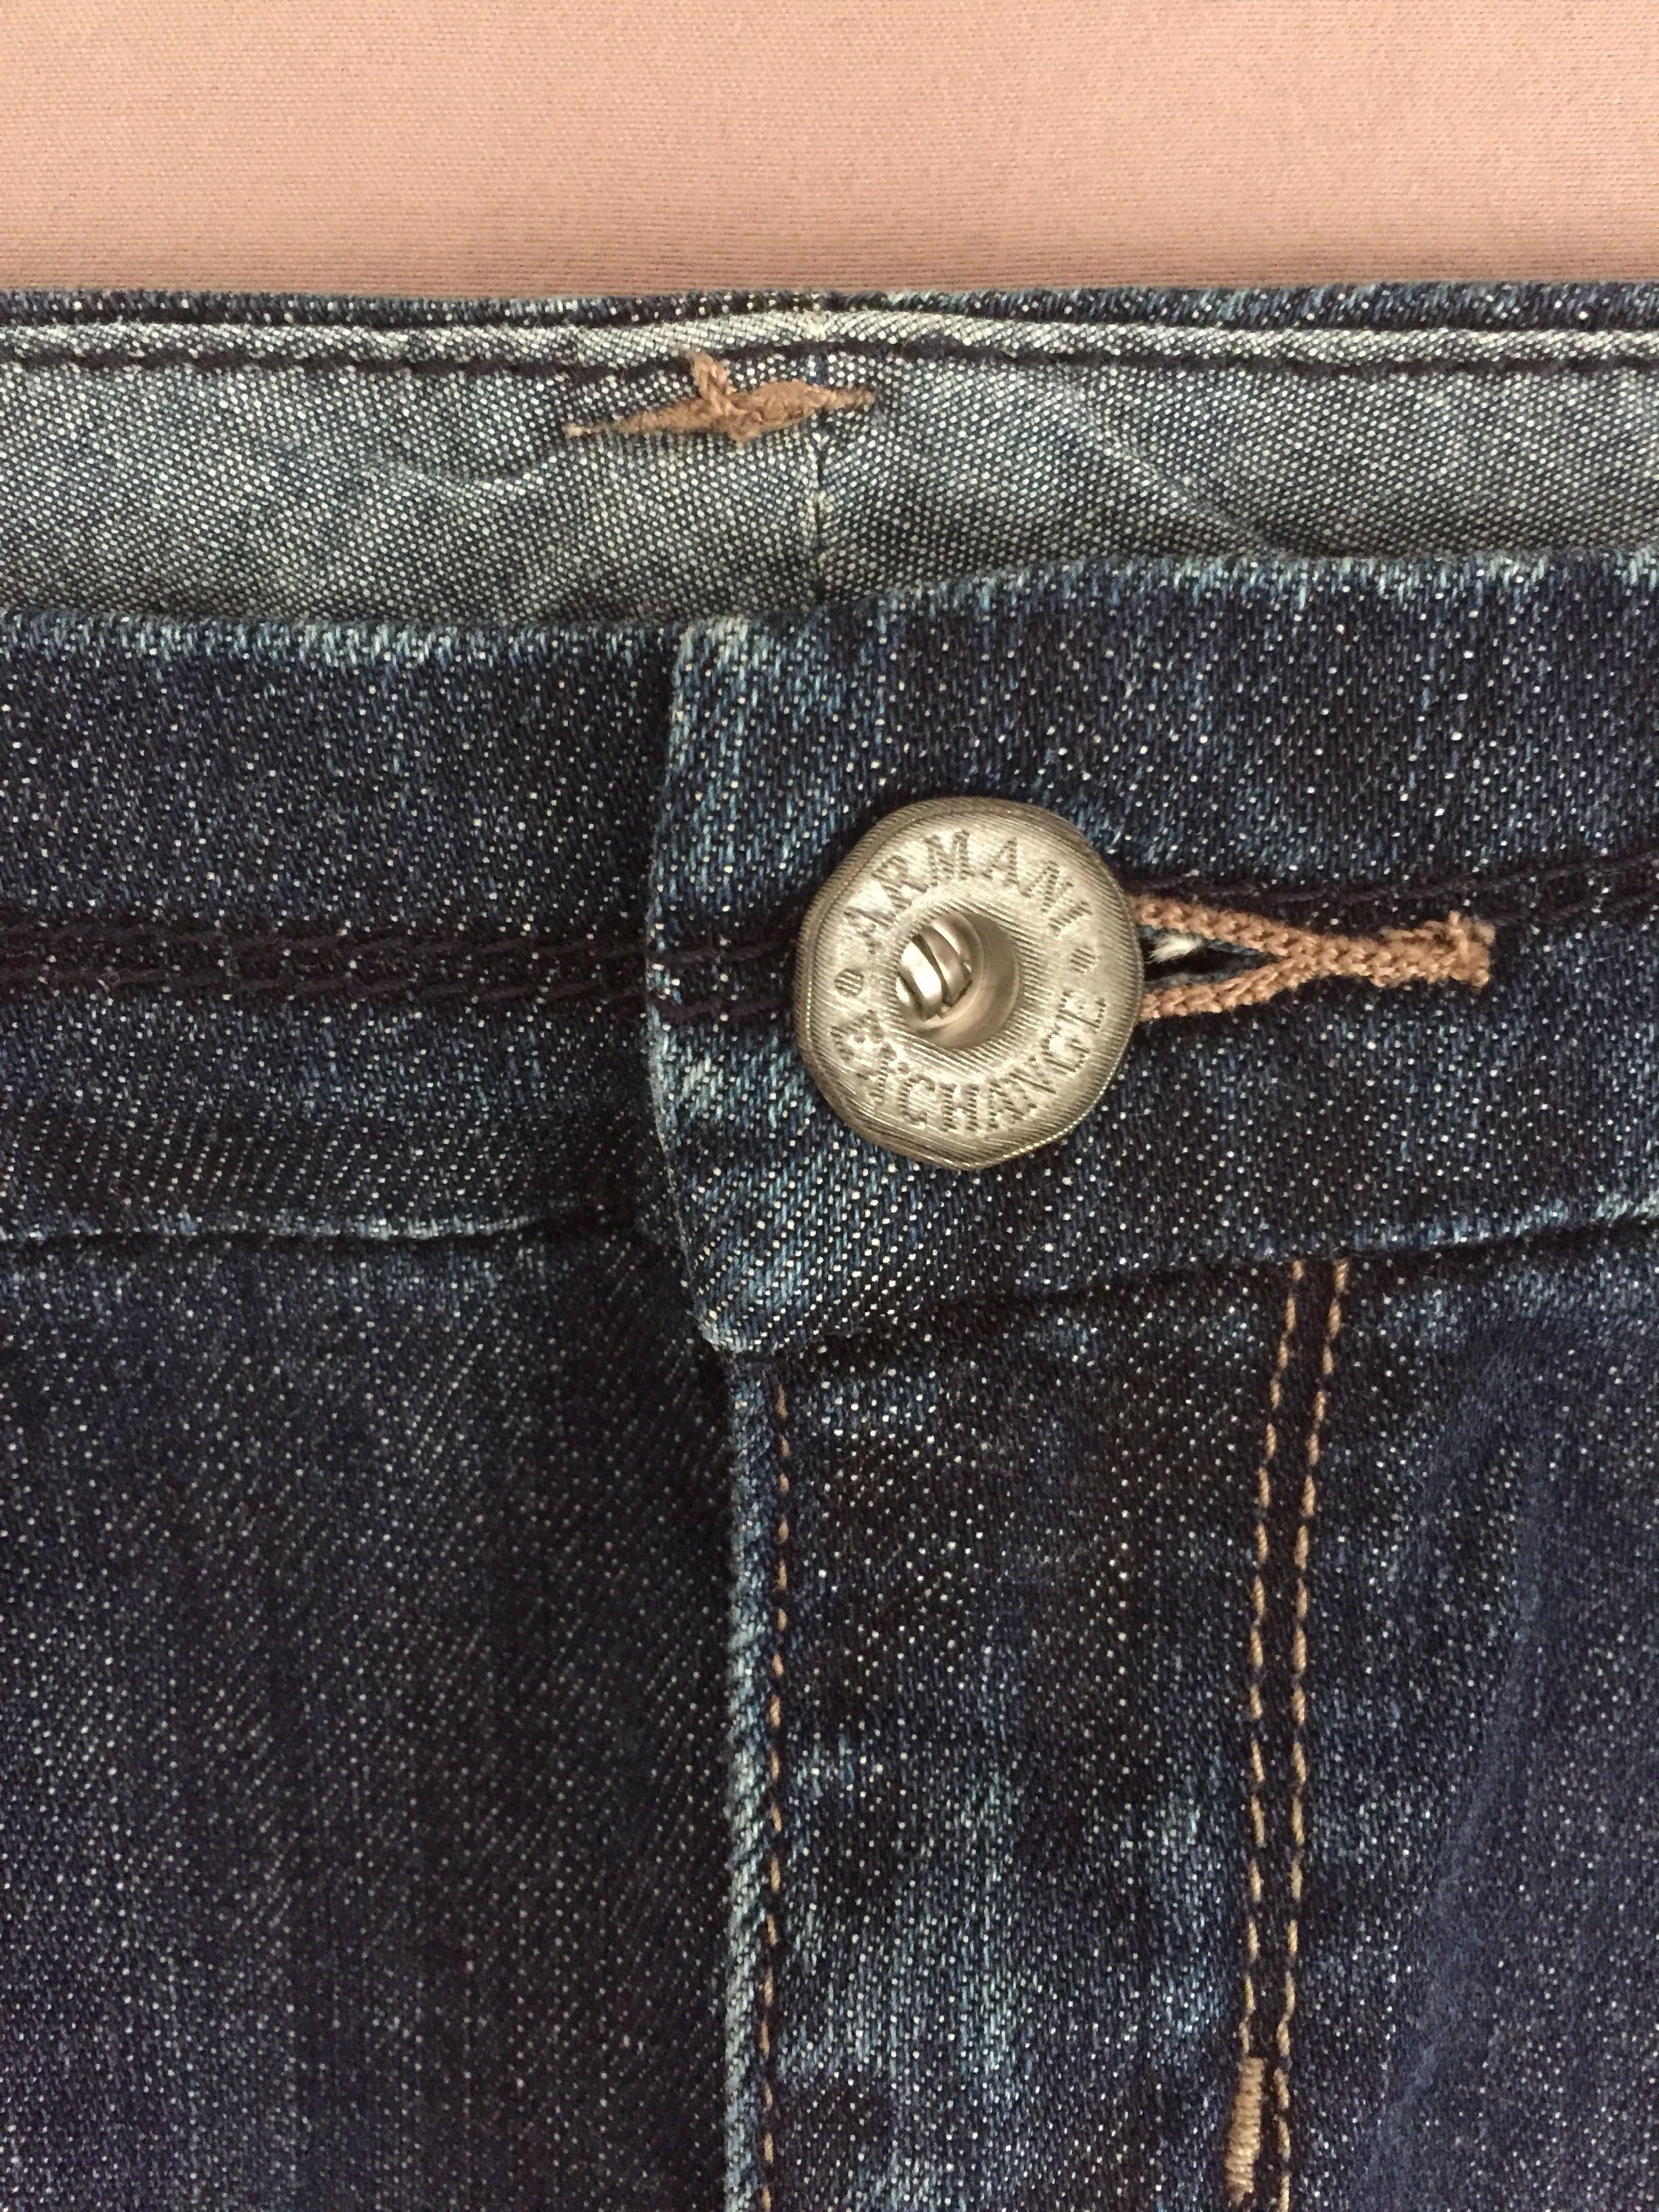 Armani Exchange Denim Skirt